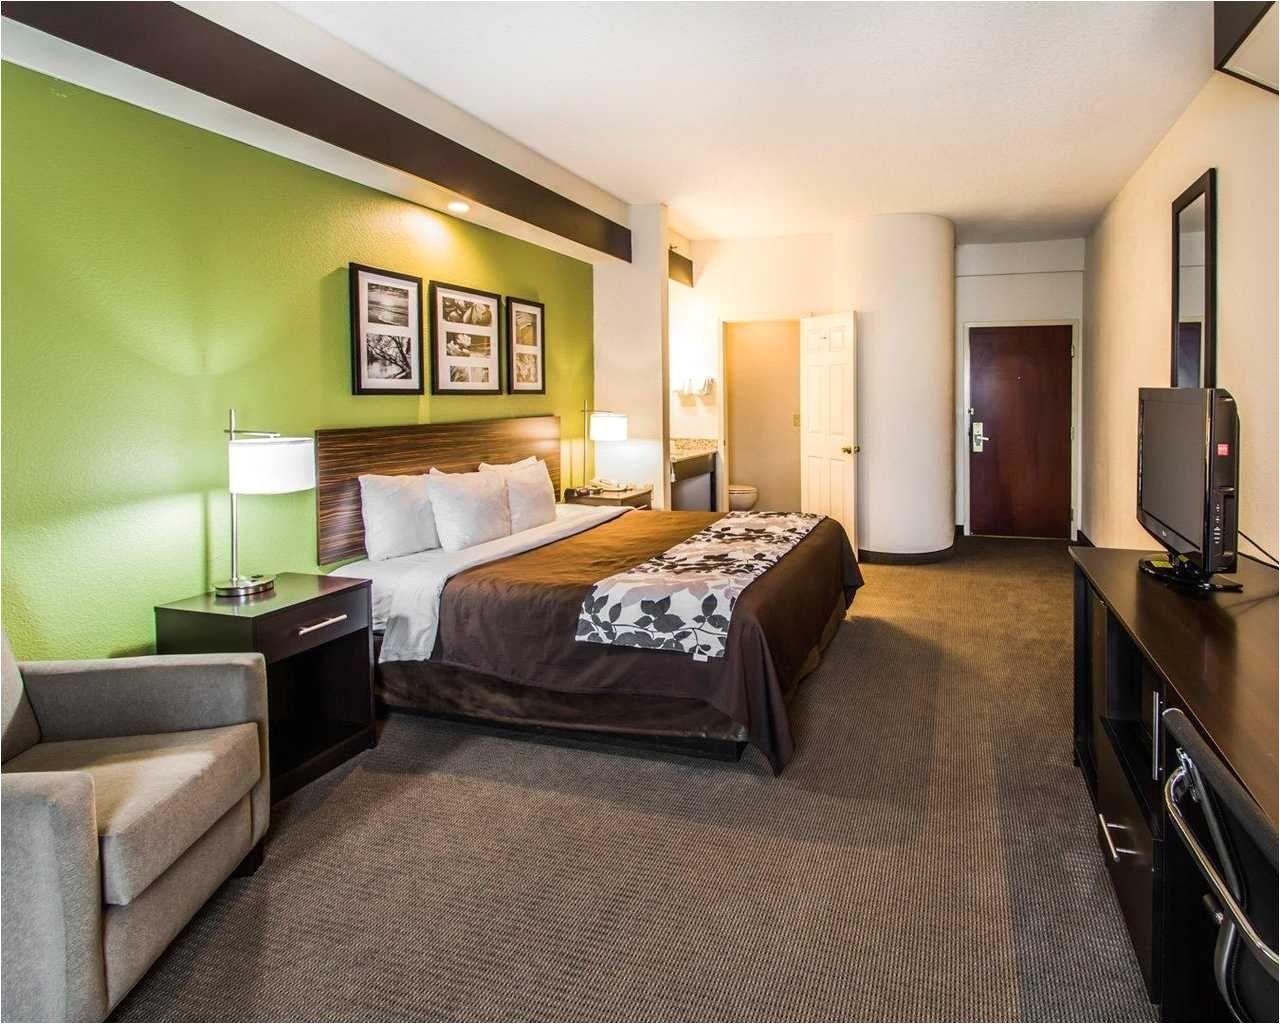 2 Bedroom Hotels In orlando Near Universal Bedroom hotel